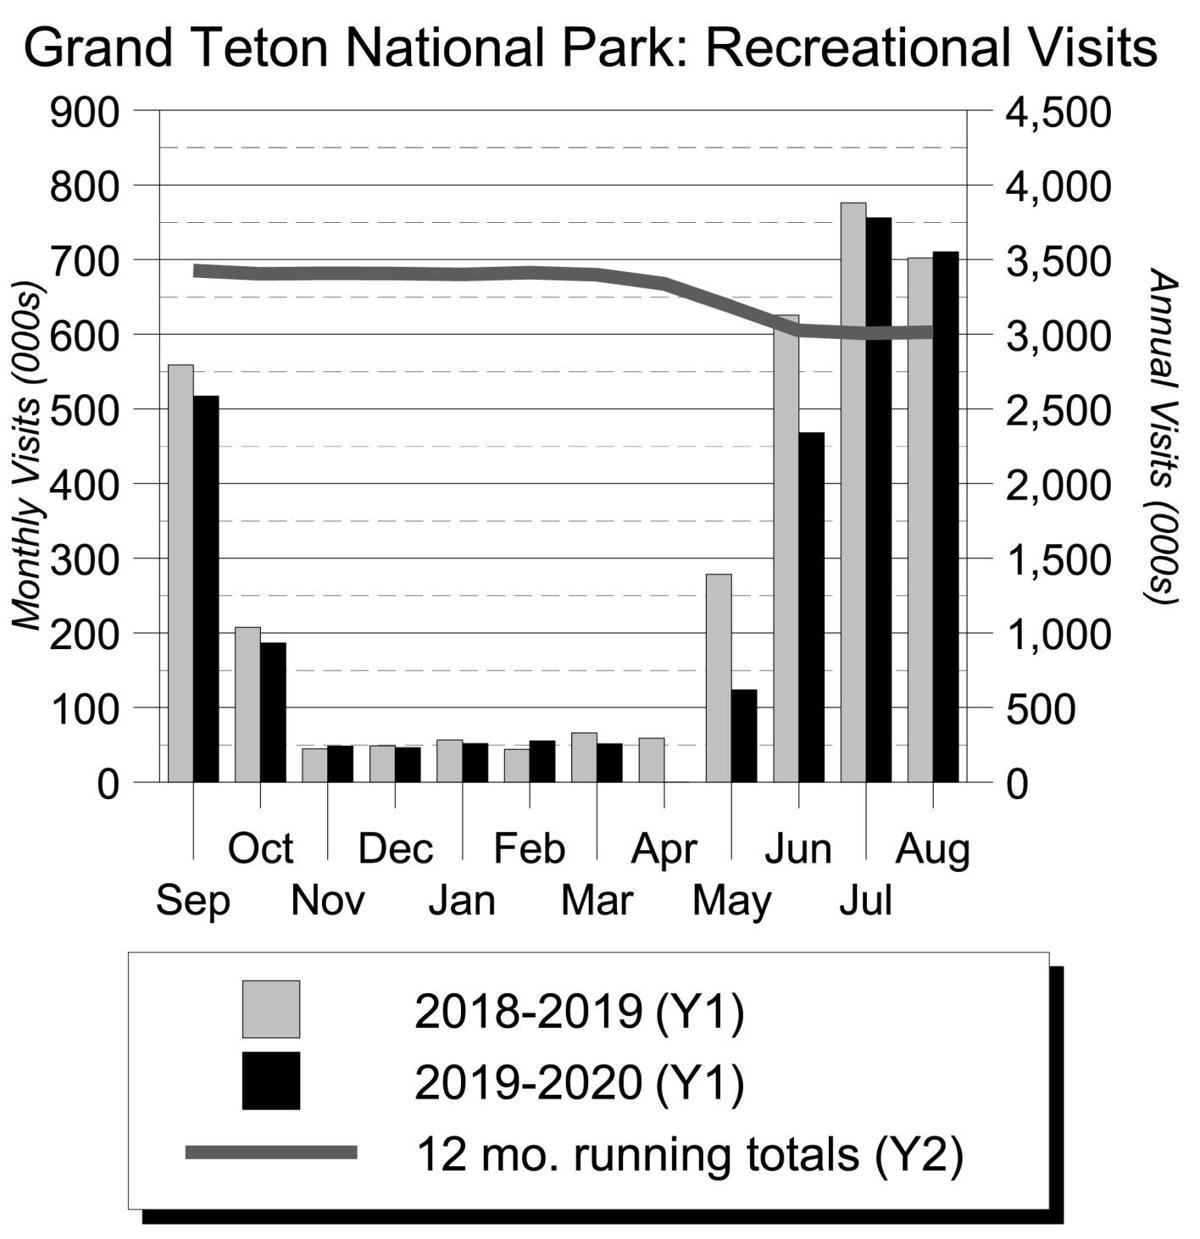 Grand Teton National Park: Recreational Visits